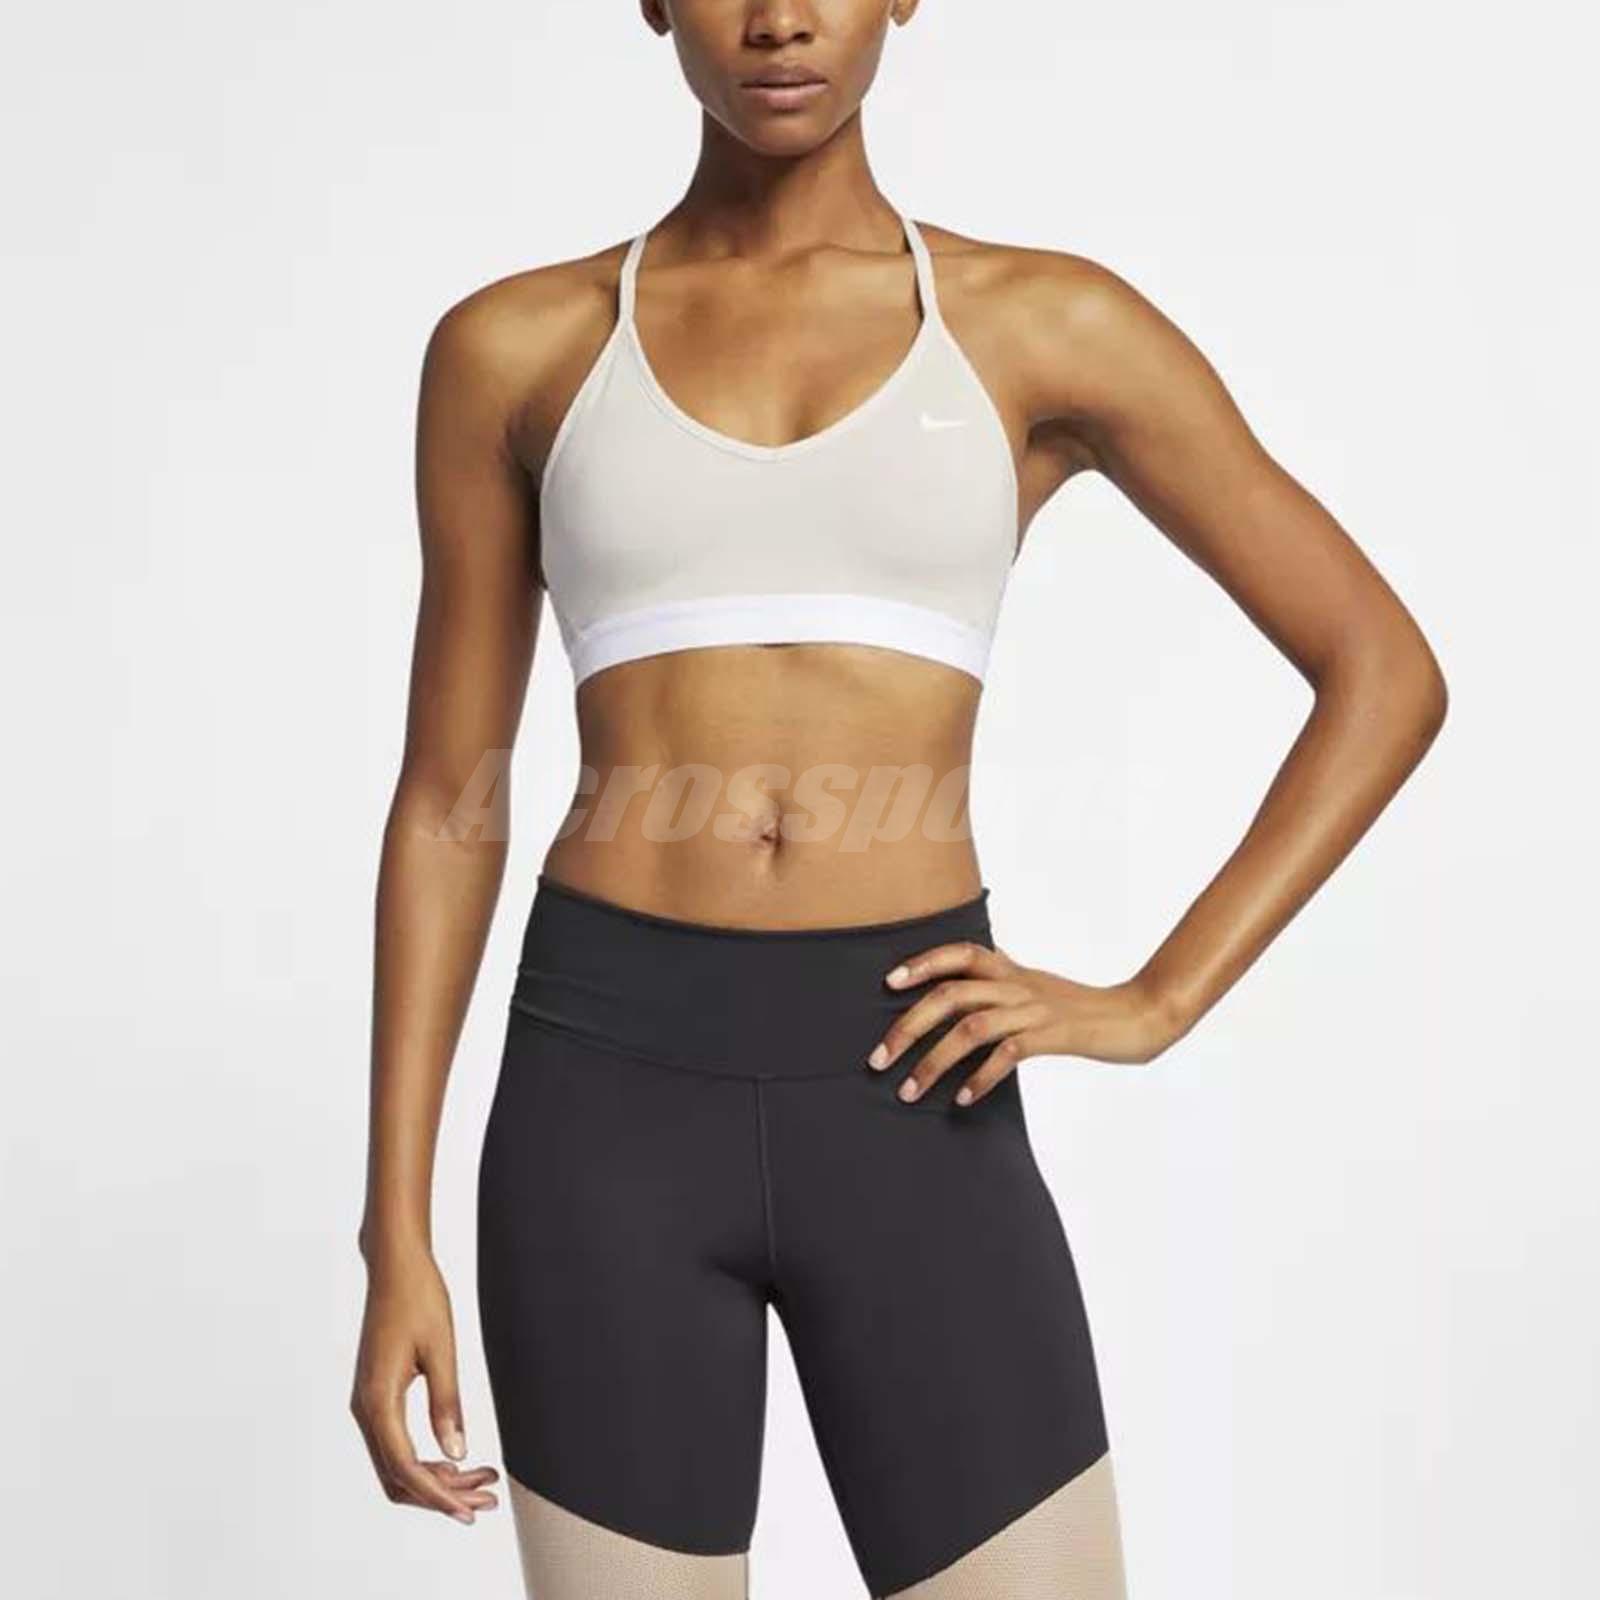 80cebd06555ee Nike Women Indy Light Support Sports Bra Yoga Pilates Workout Khaki  878615-008